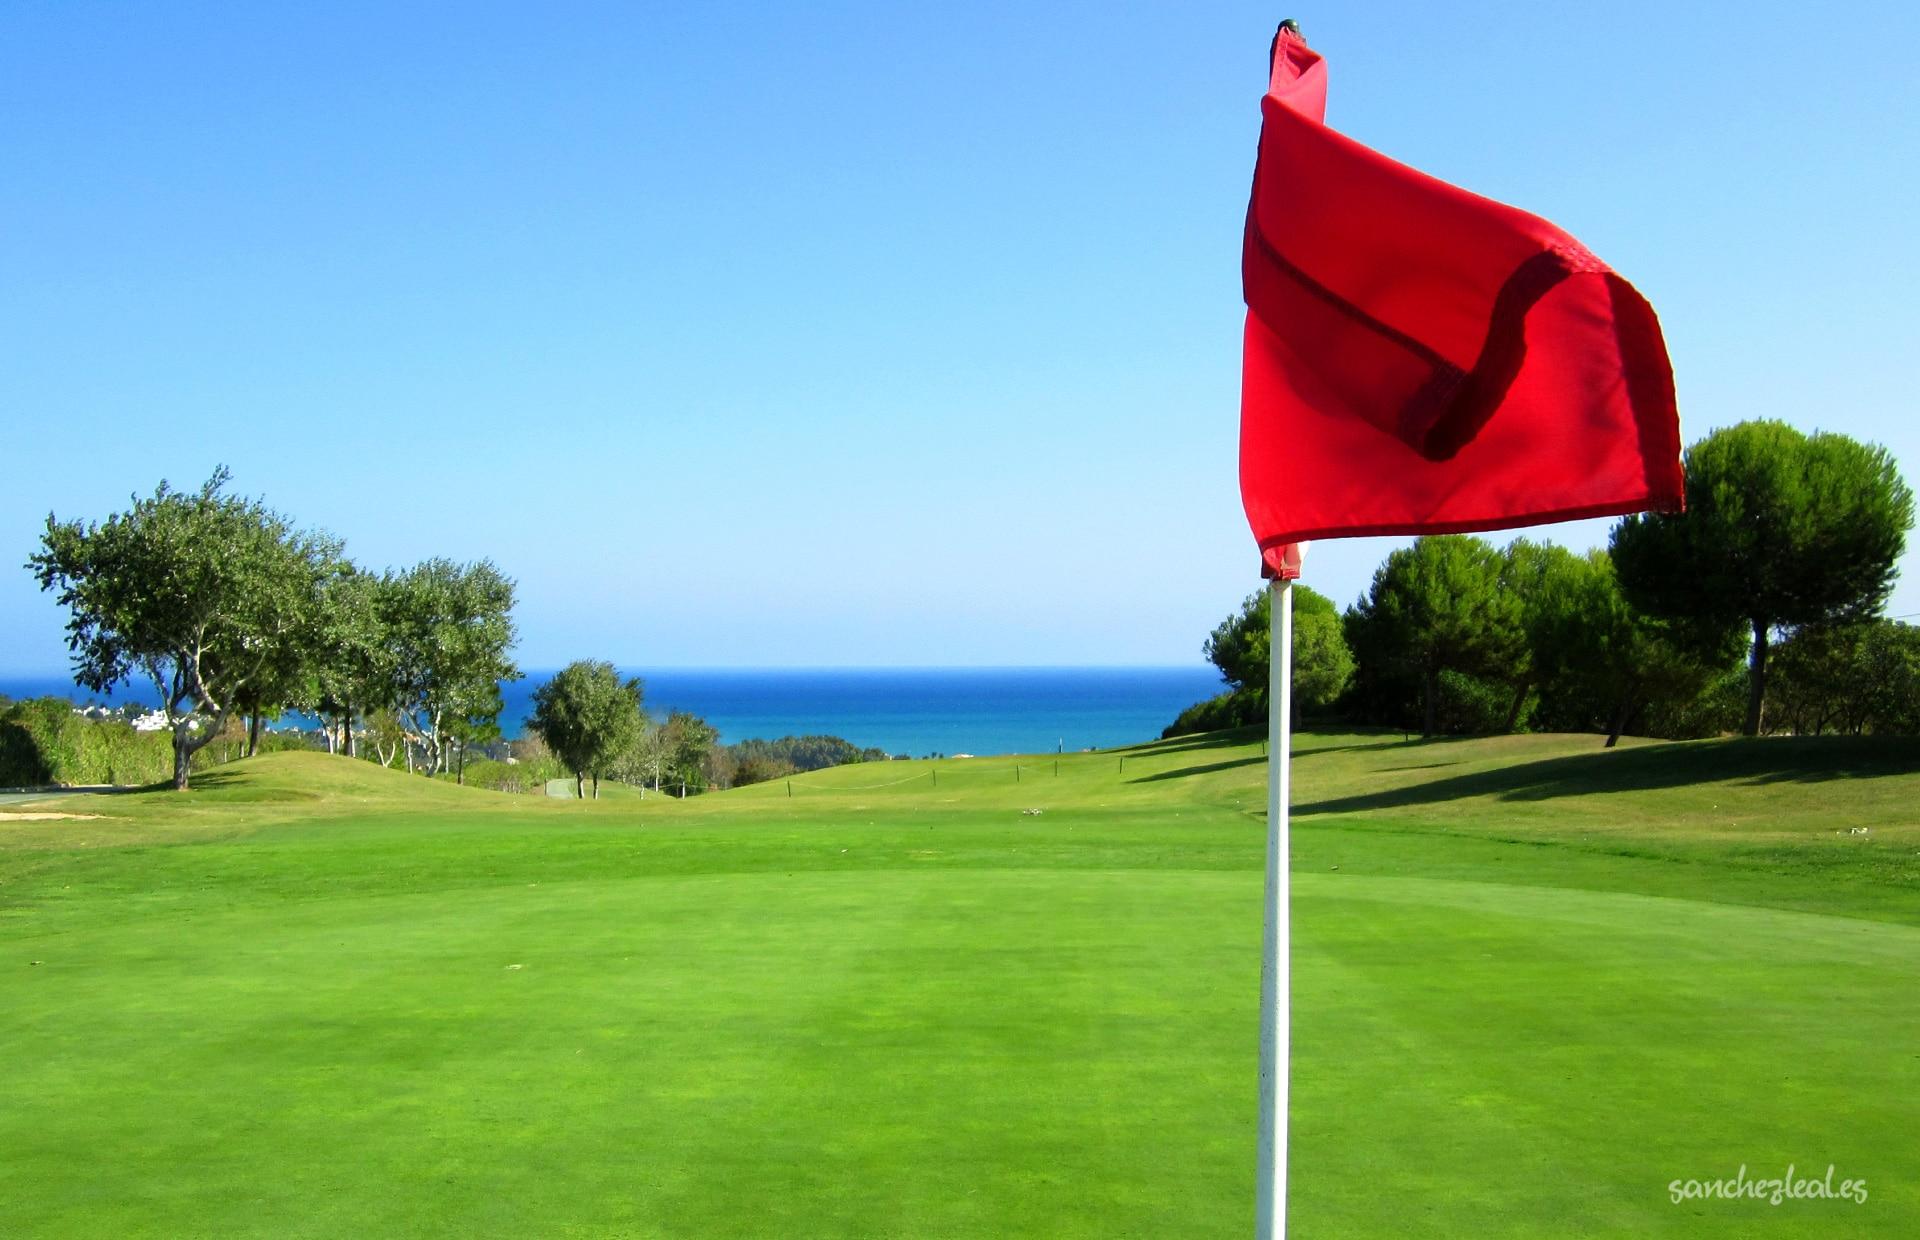 golf course do a julia golf casaresdo a julia golf casares. Black Bedroom Furniture Sets. Home Design Ideas